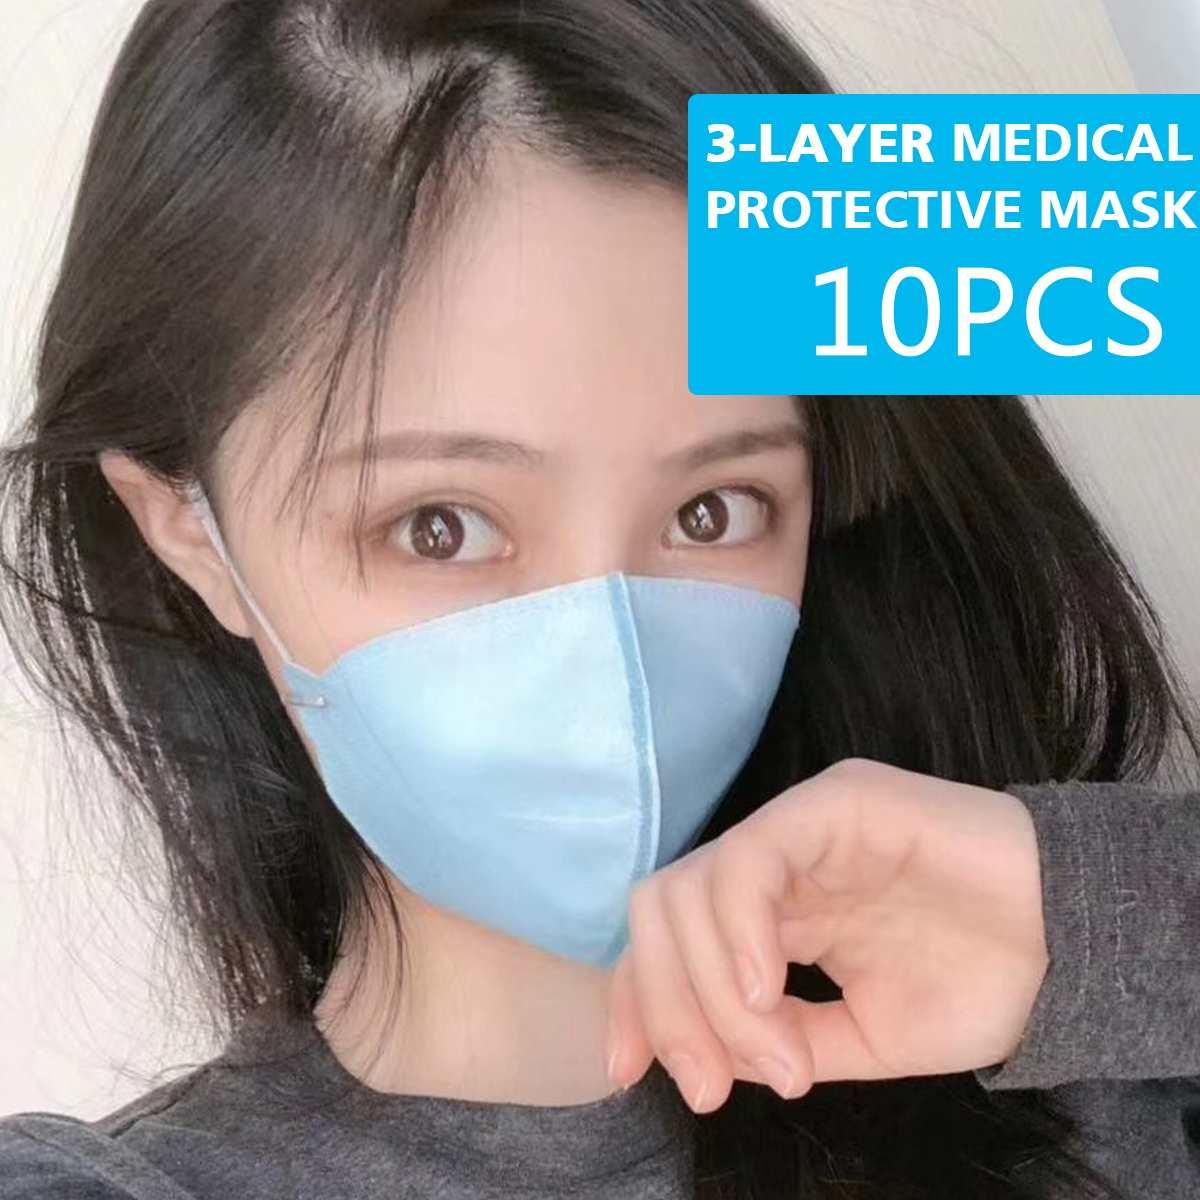 Image 2 - 10pcs Surgical Mask Face Mask Medical Masks 3 Ply Nonwoven PM2.5  Anti Virus Flu Hygiene Face Mouth Disposable Masks